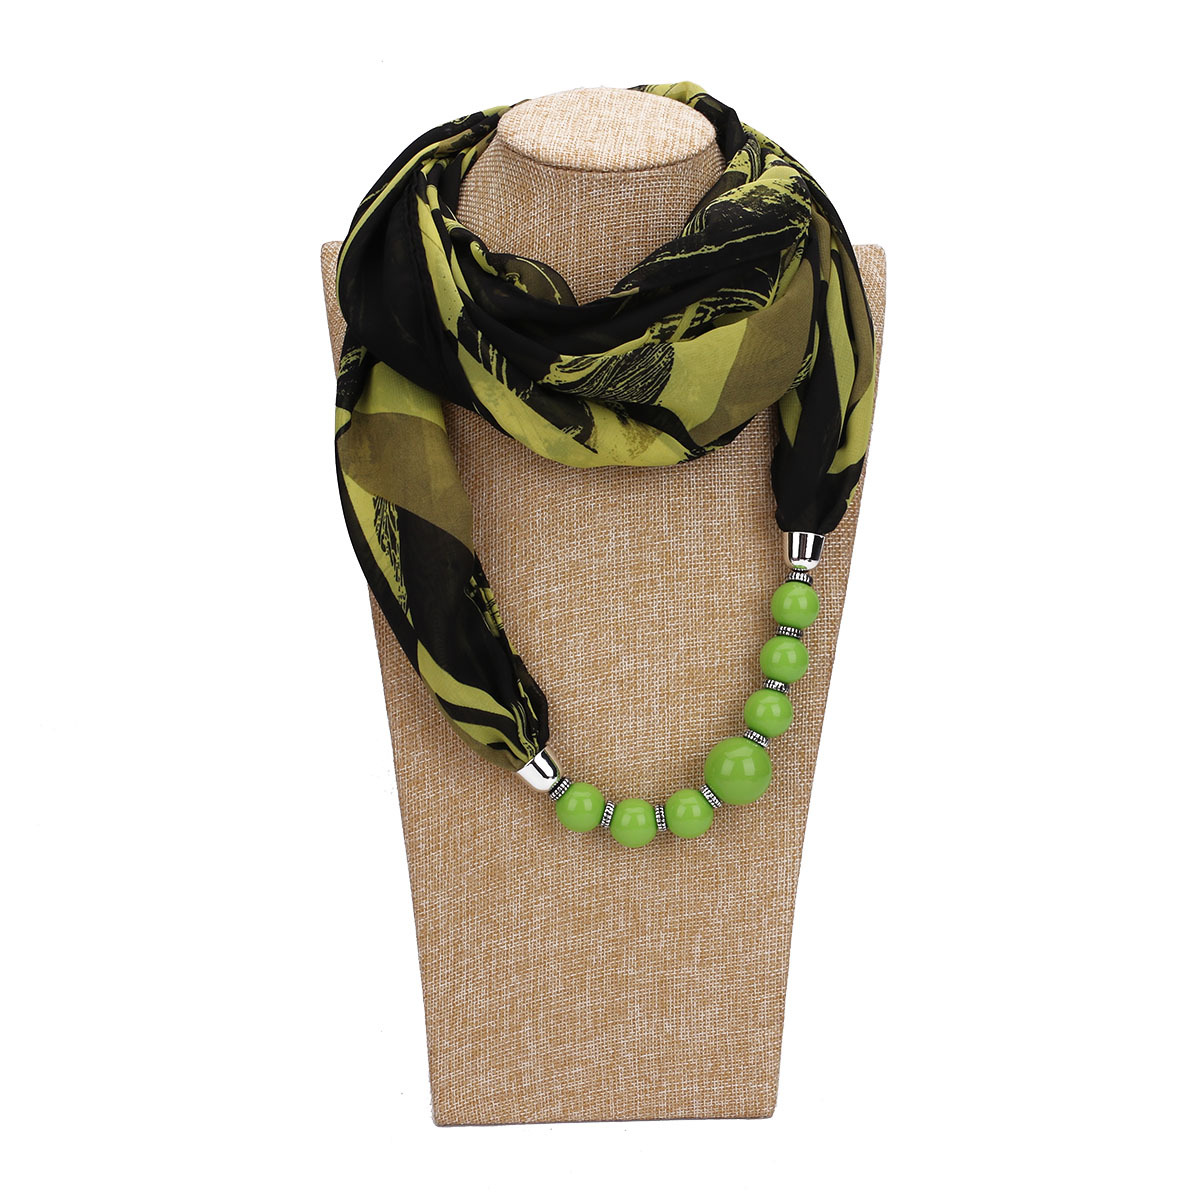 Gradient Color Neck Silk Scarf Long Slim Soft Wrap Neckwear Chiffon Shawl Women